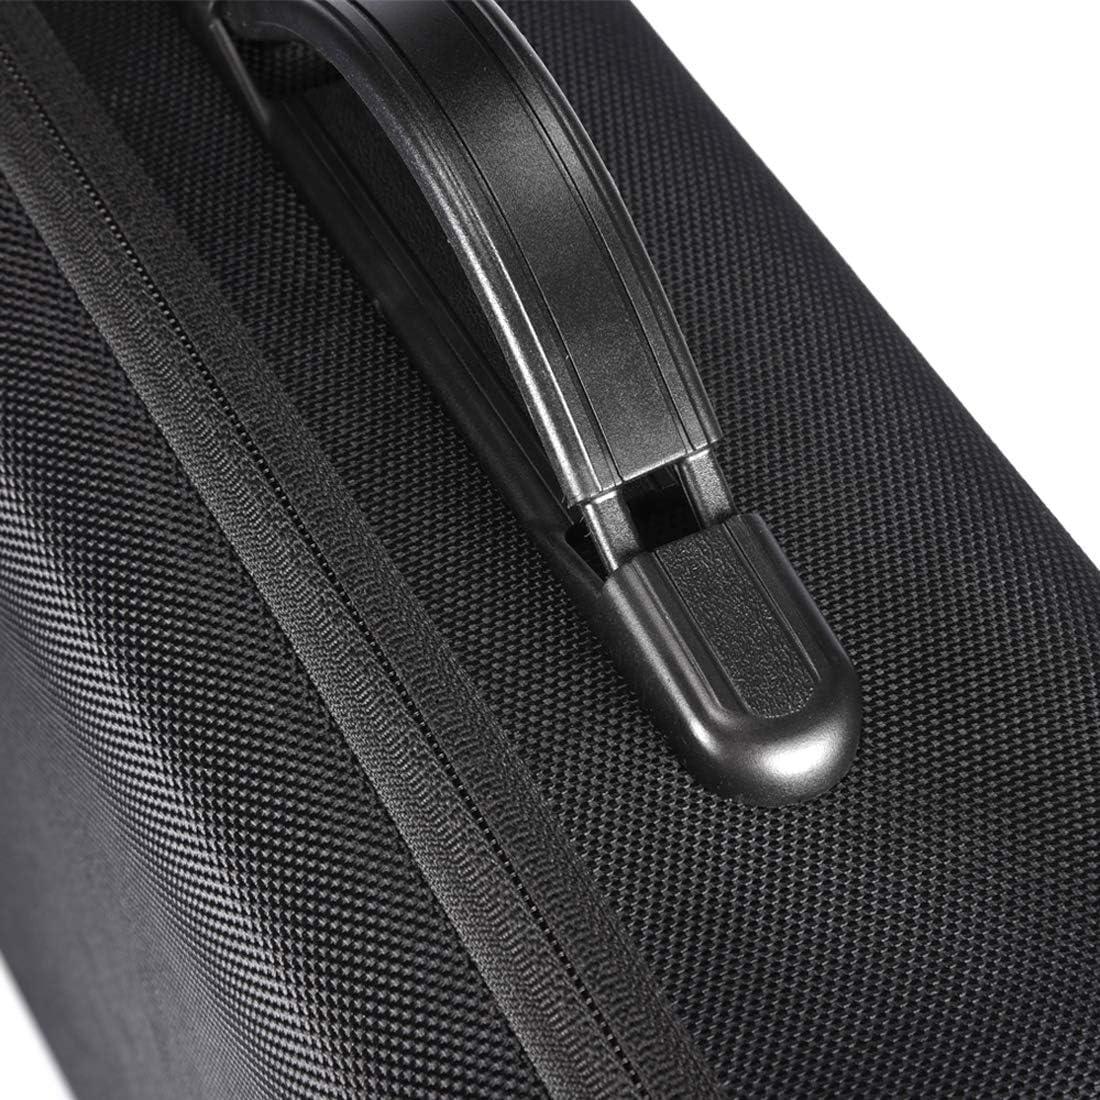 for DJI Gopro Action Camera, PU EVA Portable Single Shoulder Storage Travel Carrying Cover Case Box for DJI Mavic 2 Pro/Zoom(Black) (Color : Black) 719GtrqTQdLSL1100_